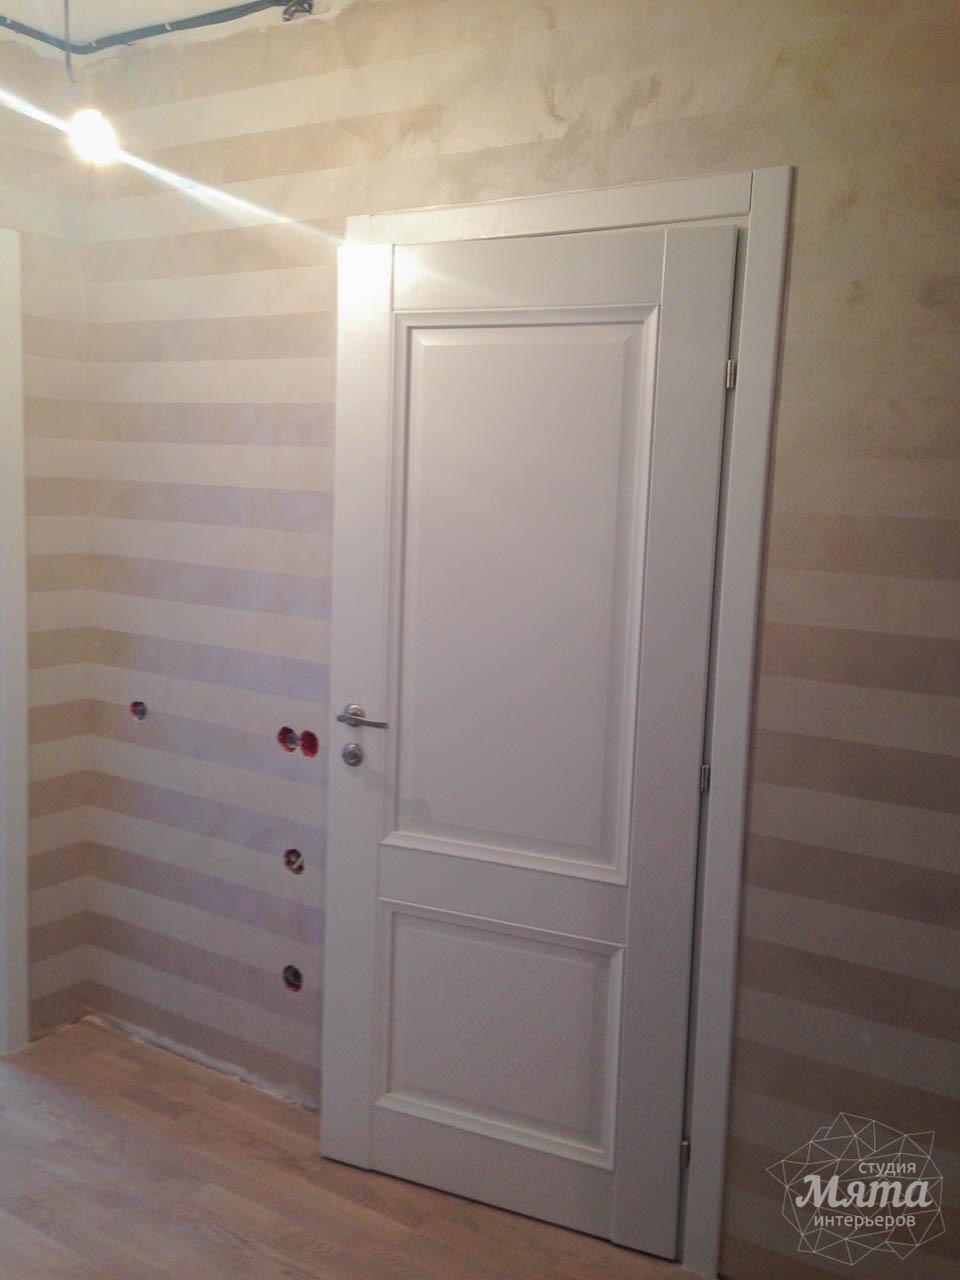 Дизайн интерьера и ремонт трехкомнатной квартиры по ул. Фучика 9 55